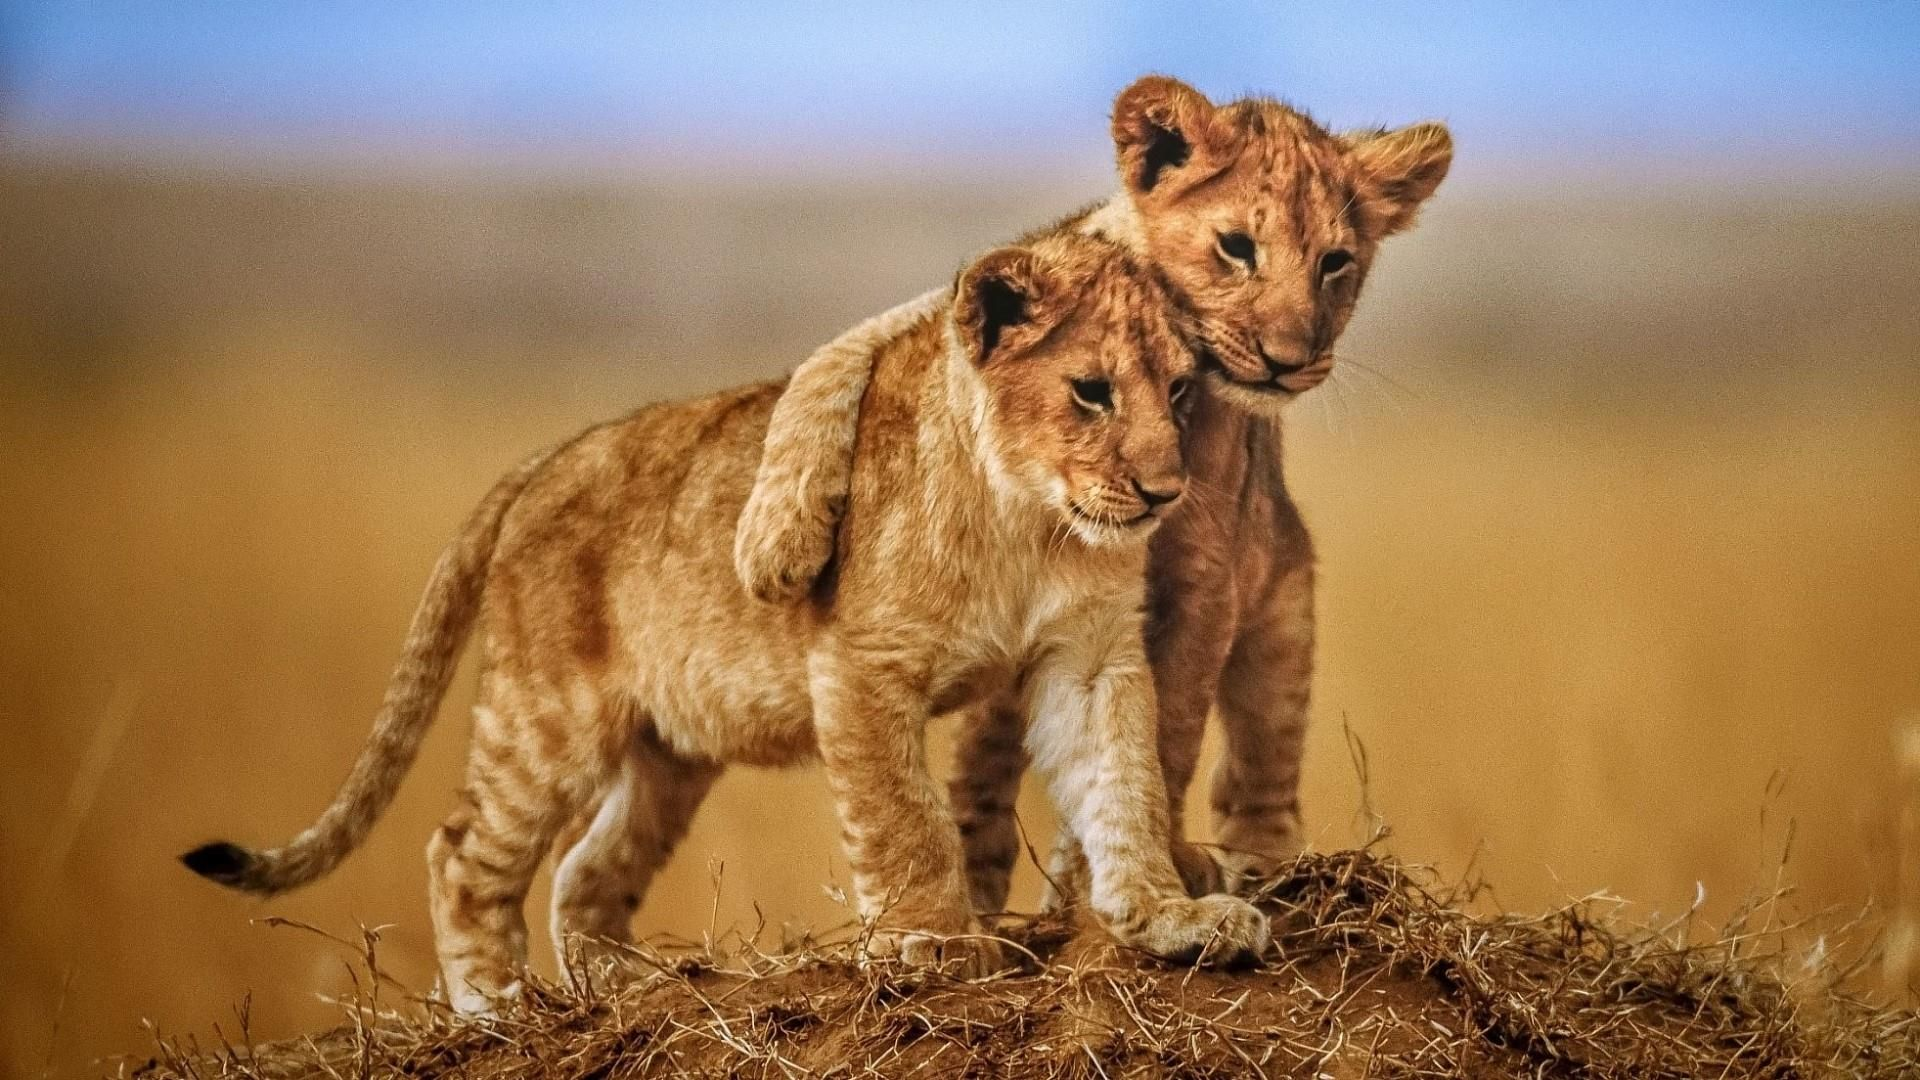 Cute Lion Cubs Wallpaper Animals Beautiful Lion Photography